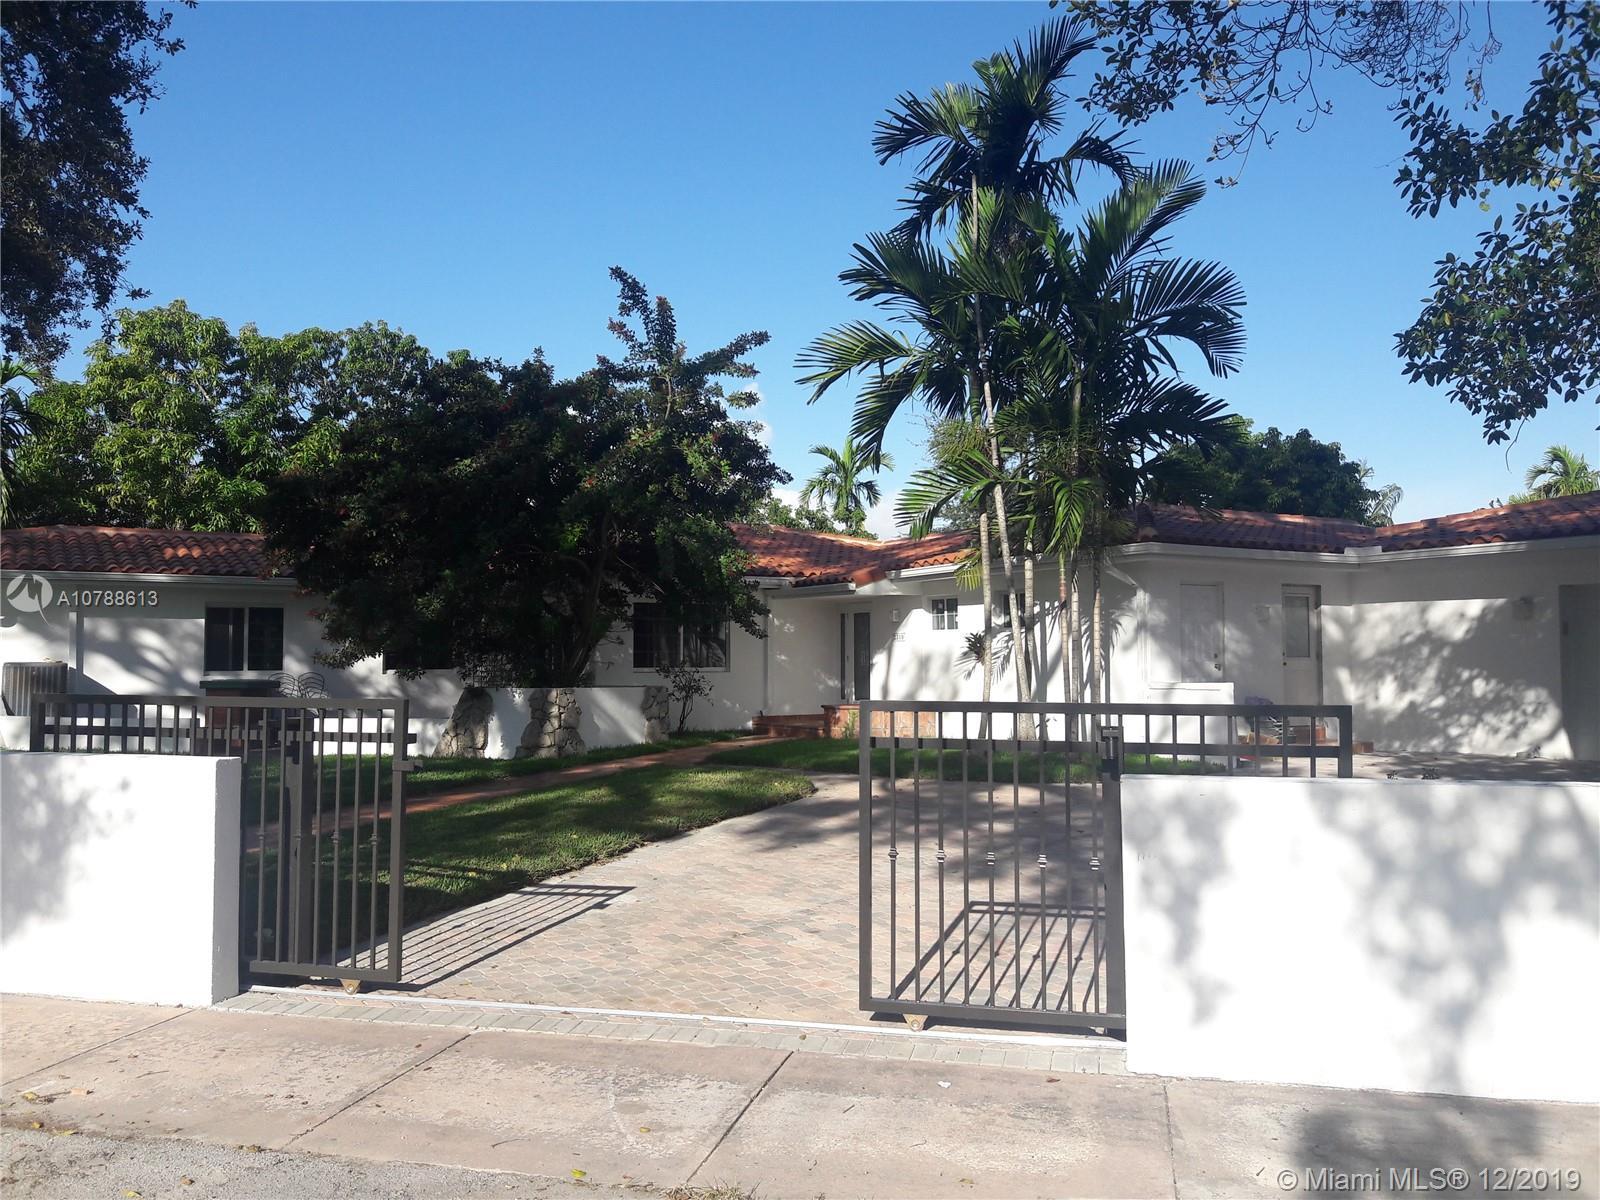 2310 Country Clb Prado, Coral Gables, FL, 33134